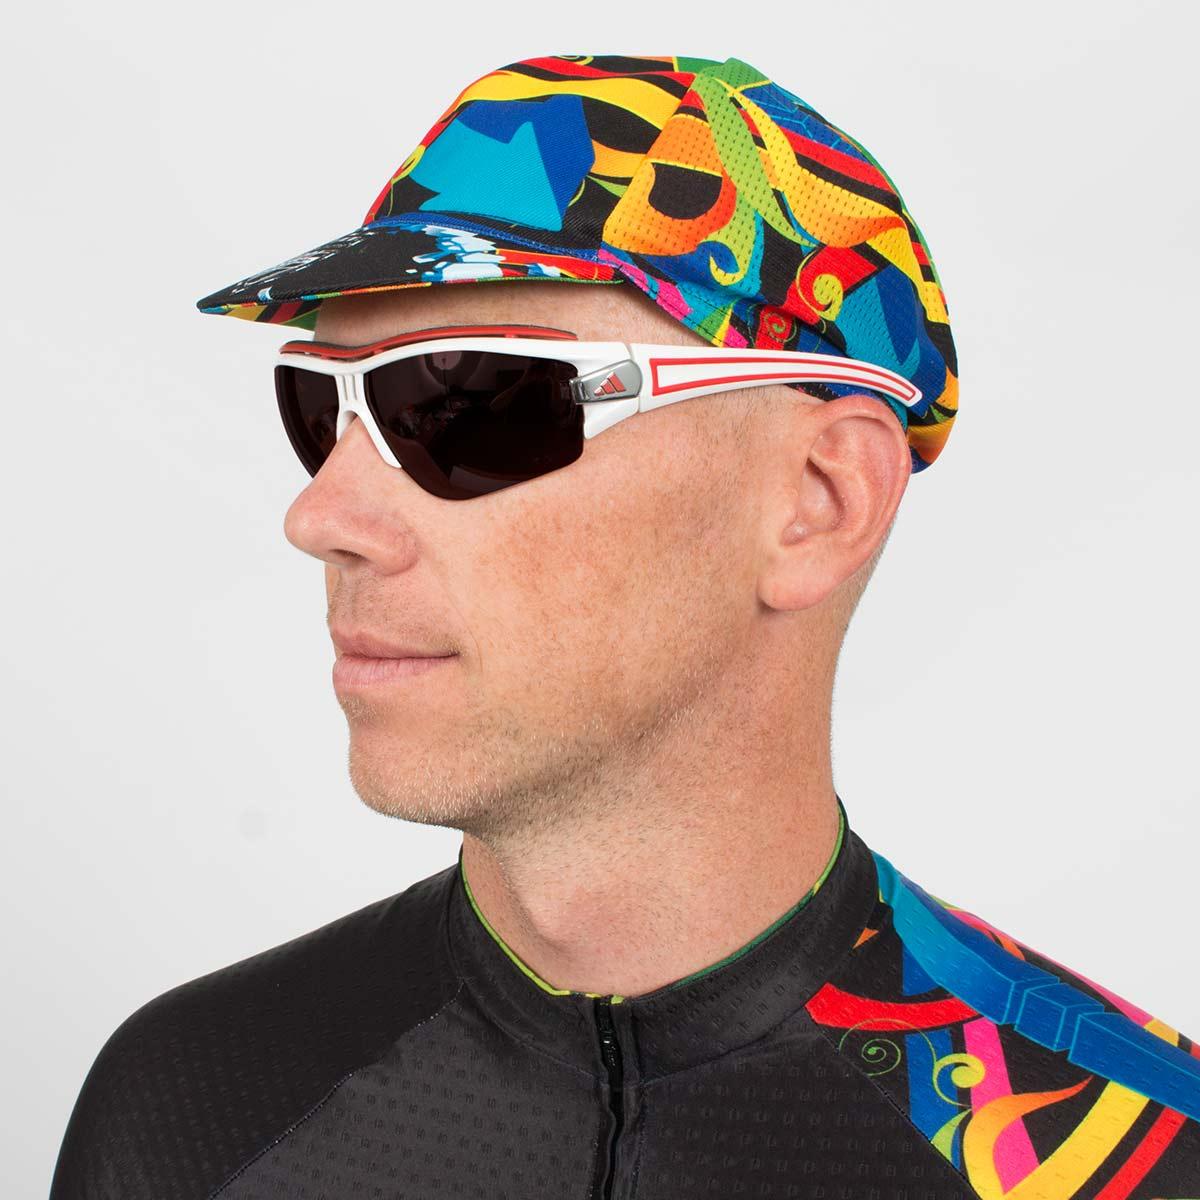 Wildstyle Euro Cycling Cap Limited Edition Blackchrome Graffiti Vl66935